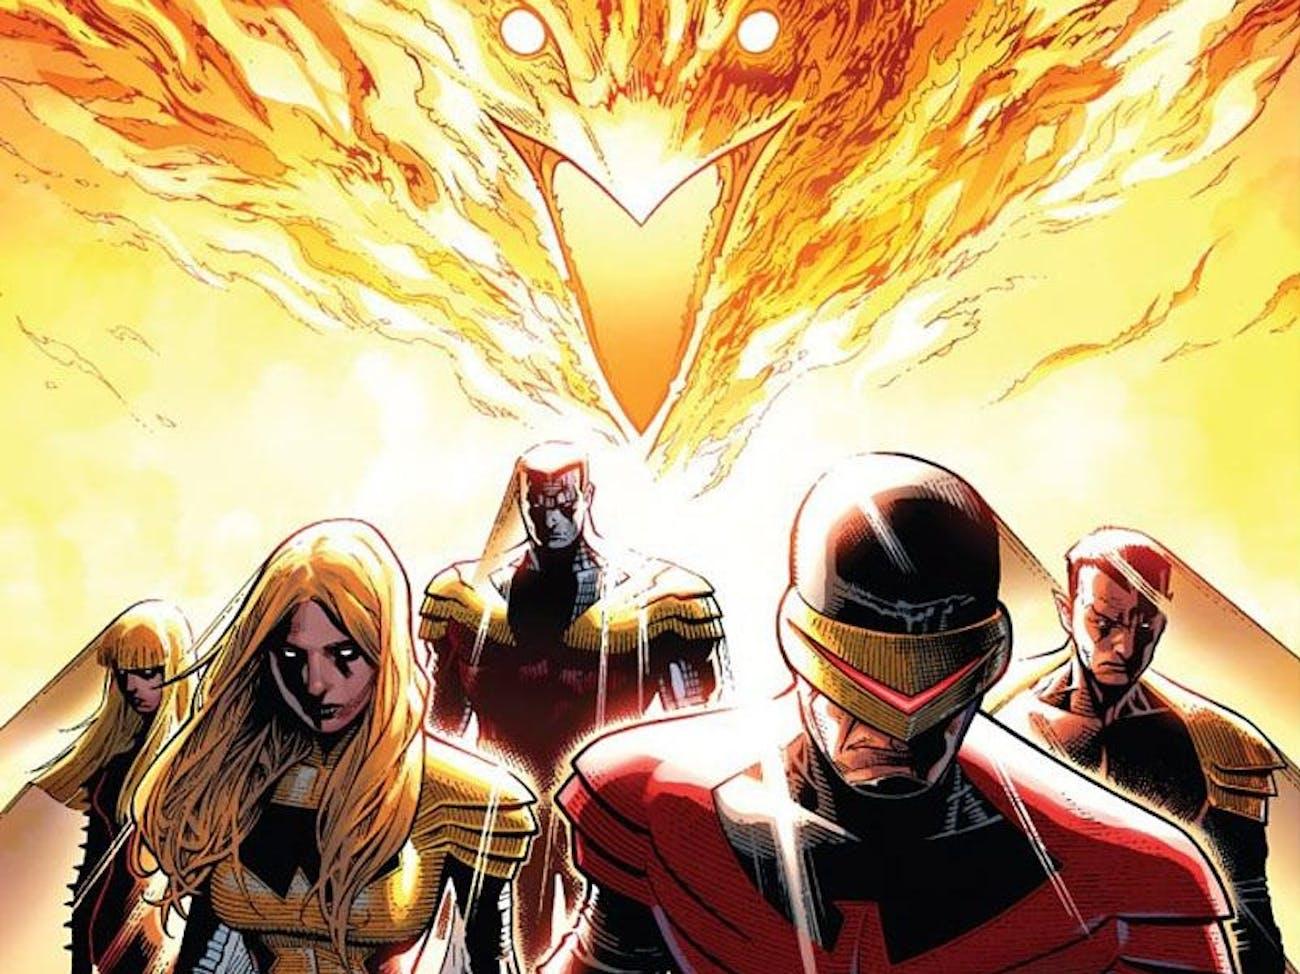 Dark Phoenix' Spoilers Ending Explained: How It Sets Up